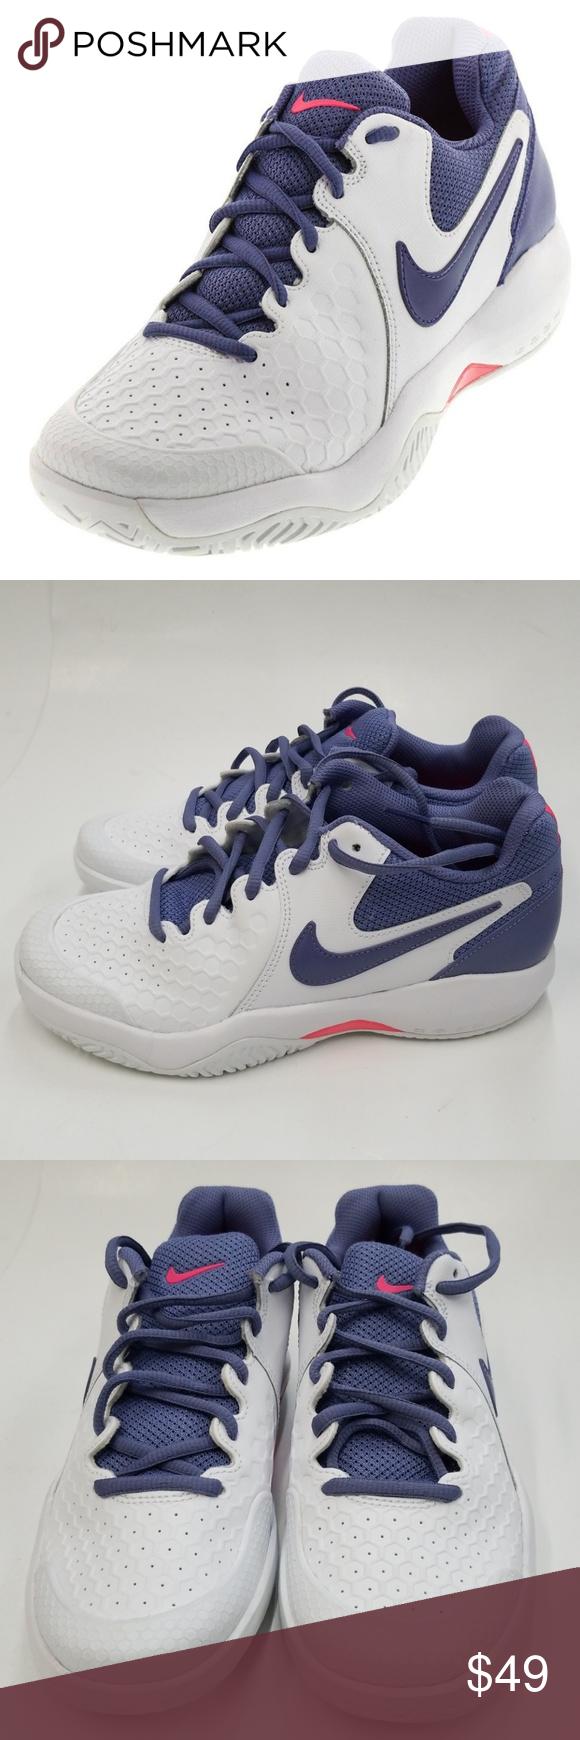 b4591da4327 Nike Air Zoom Resistance Ladies Tennis Shoes 6.5 Nike Air Zoom ...